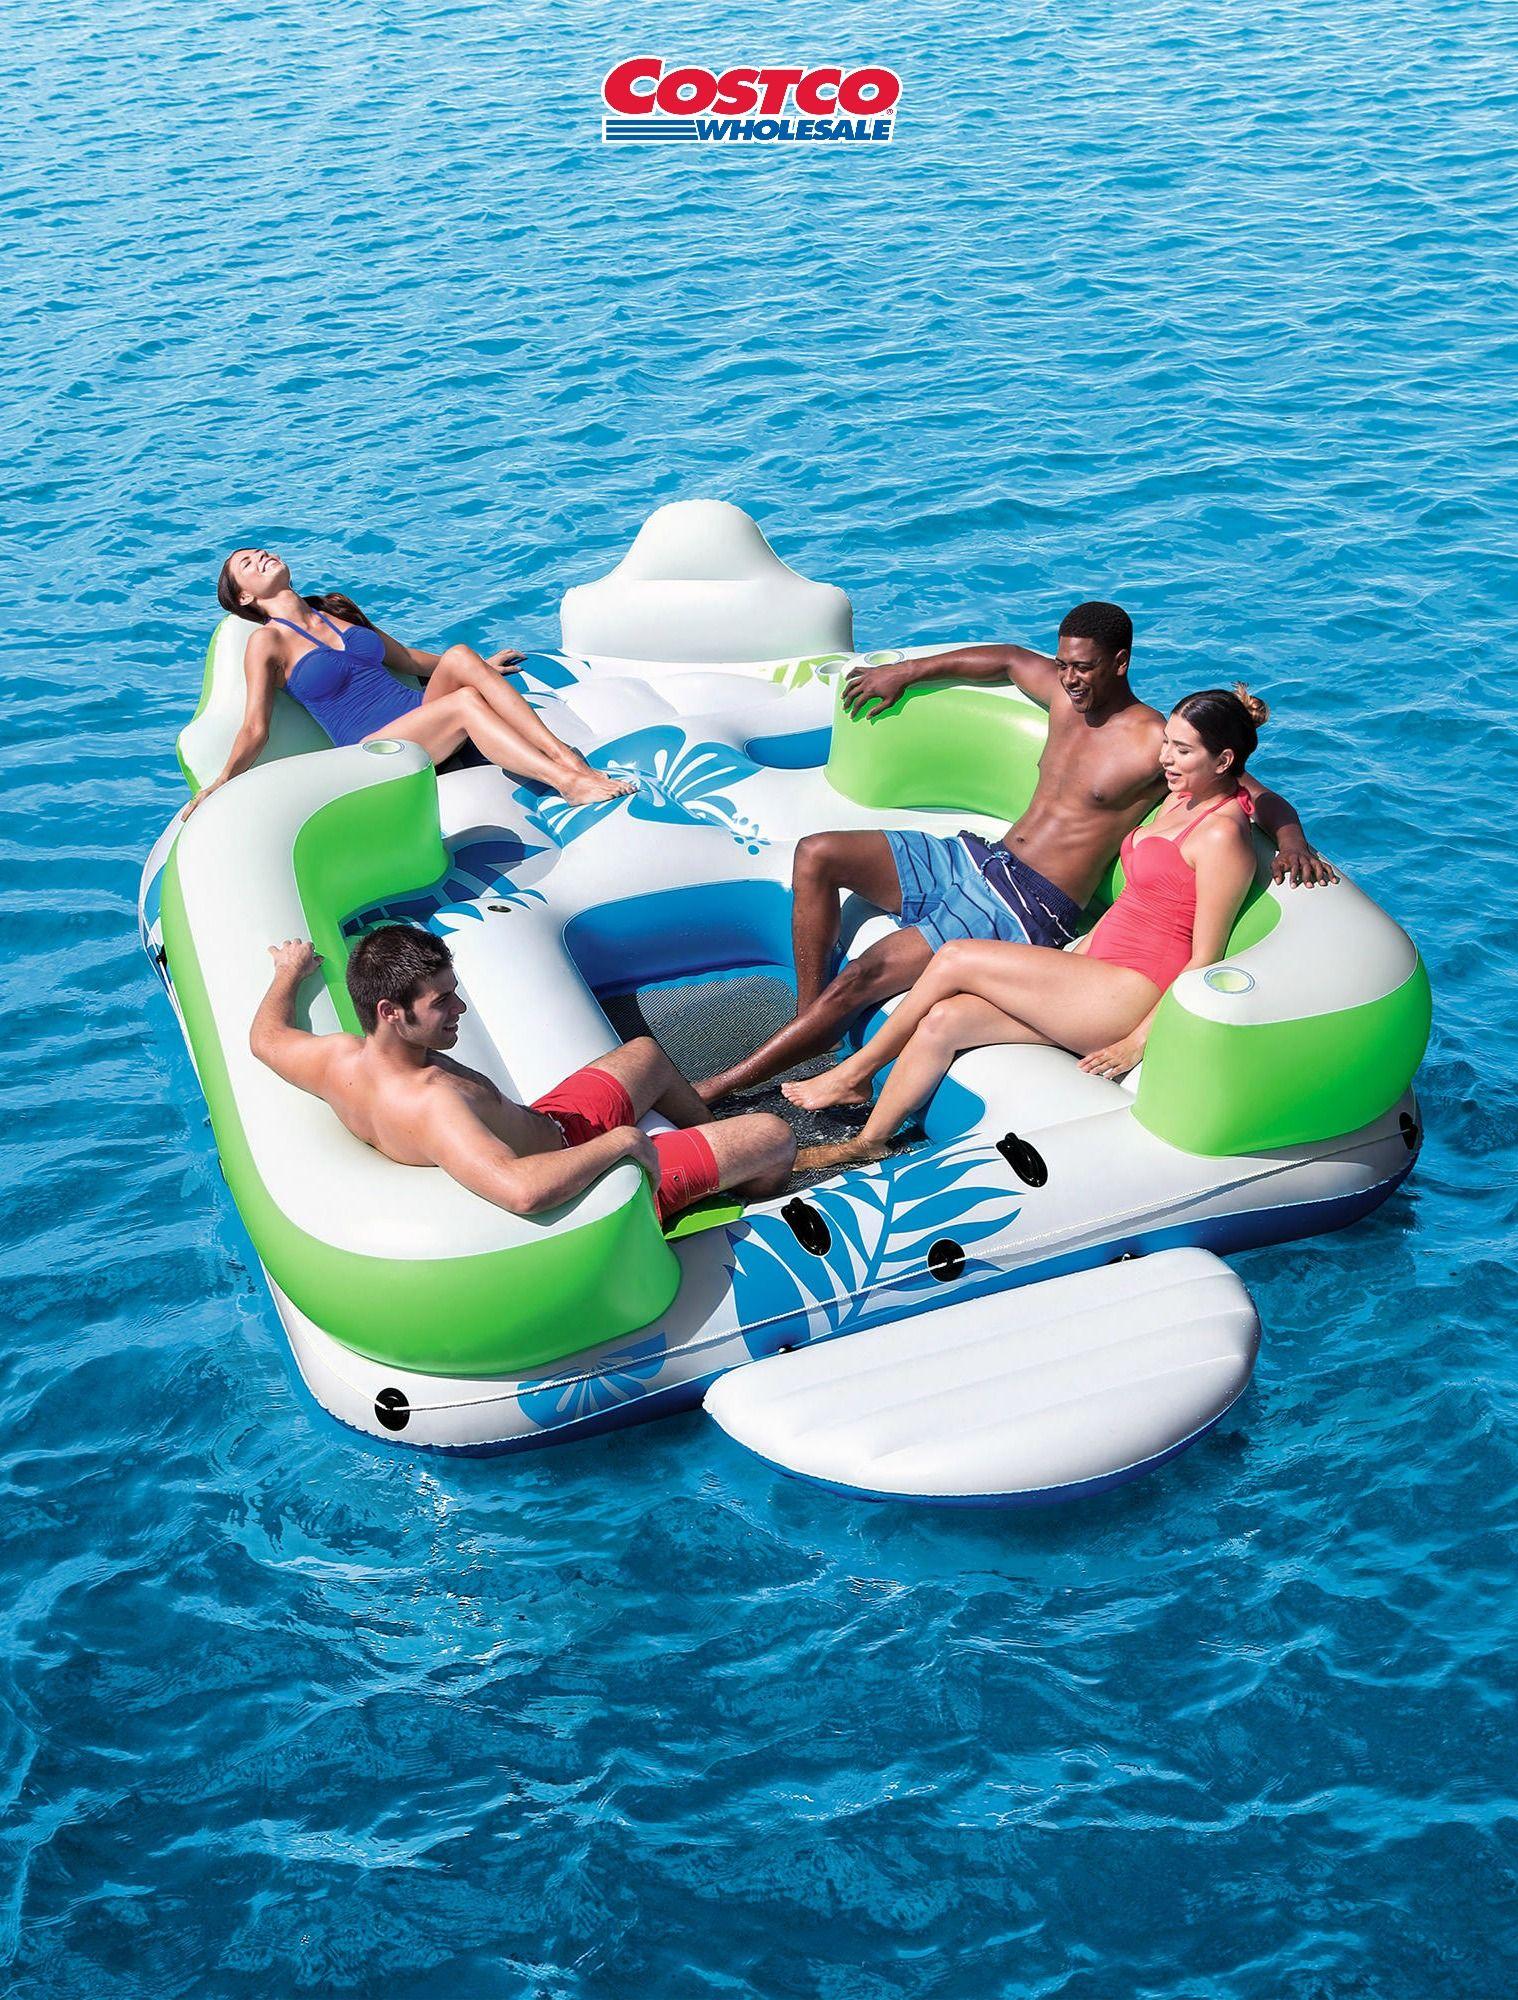 Gang Plank Lounging Inflatable Island HD Mattress Raft Lilo Tube for beach pool